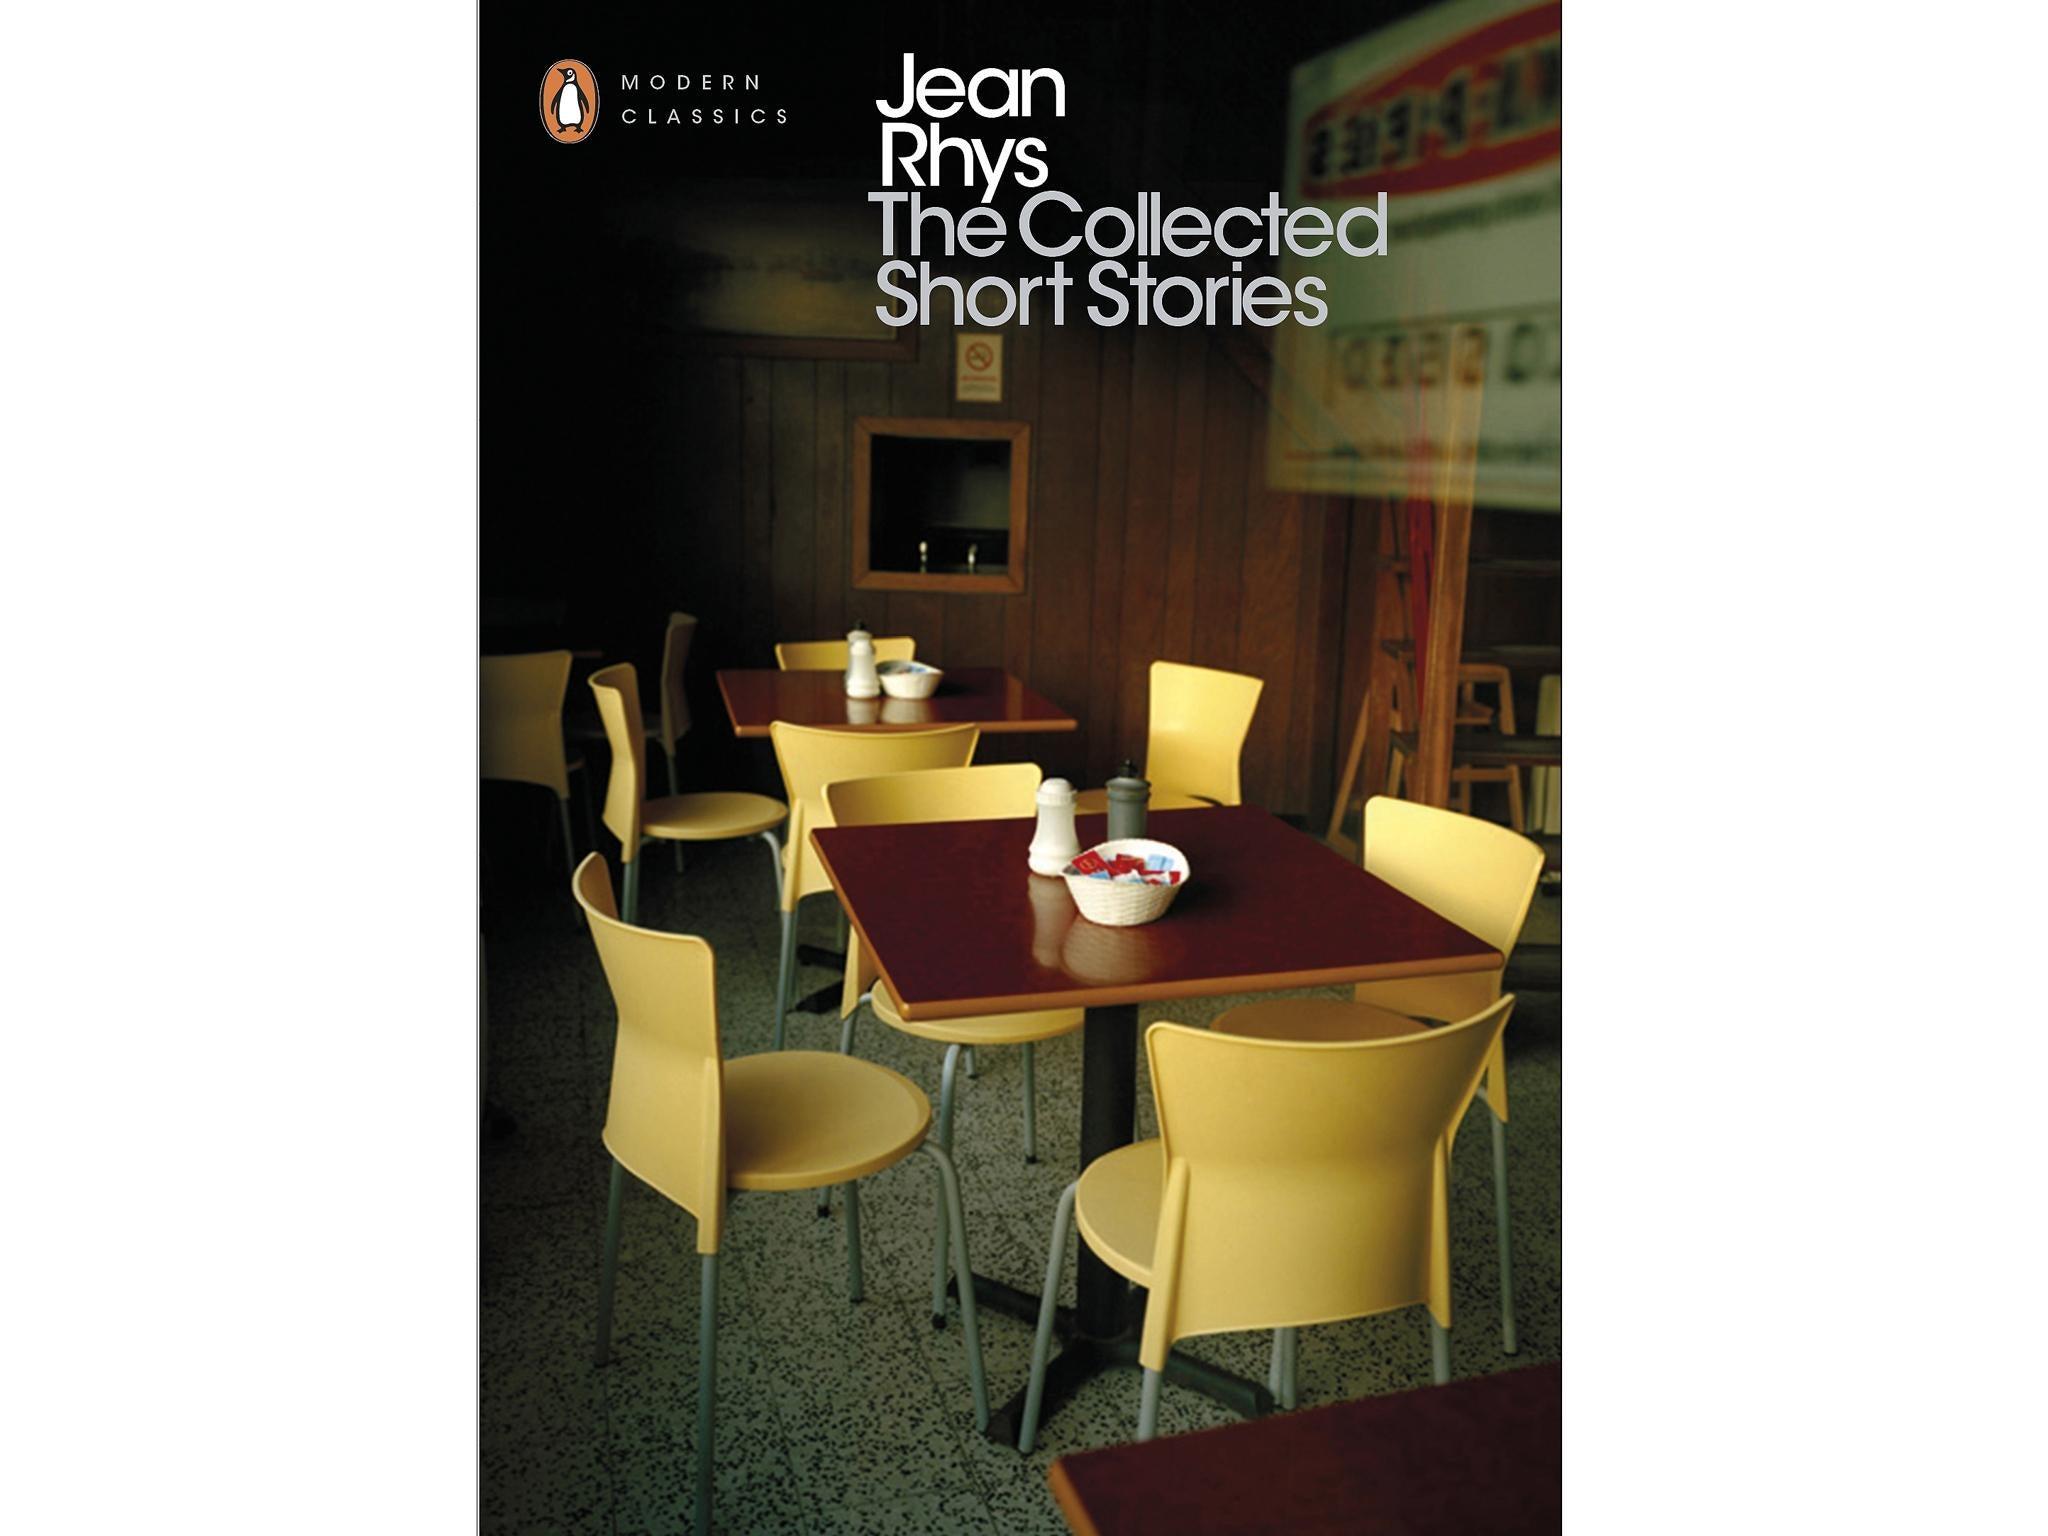 famous gothic short stories